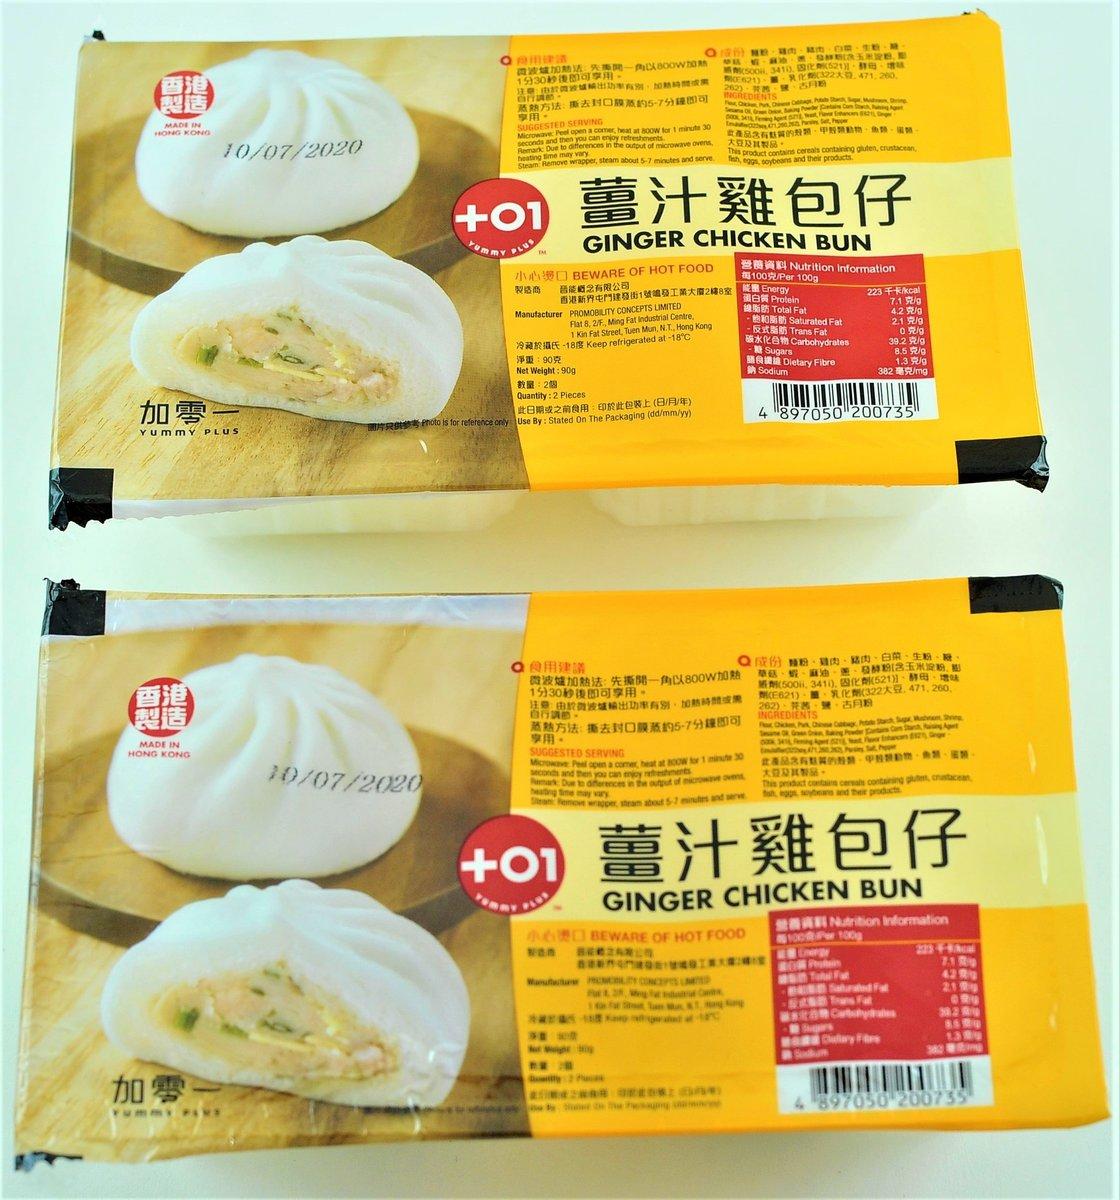 Ginger Chicken Bun (2 packs) (Frozen)